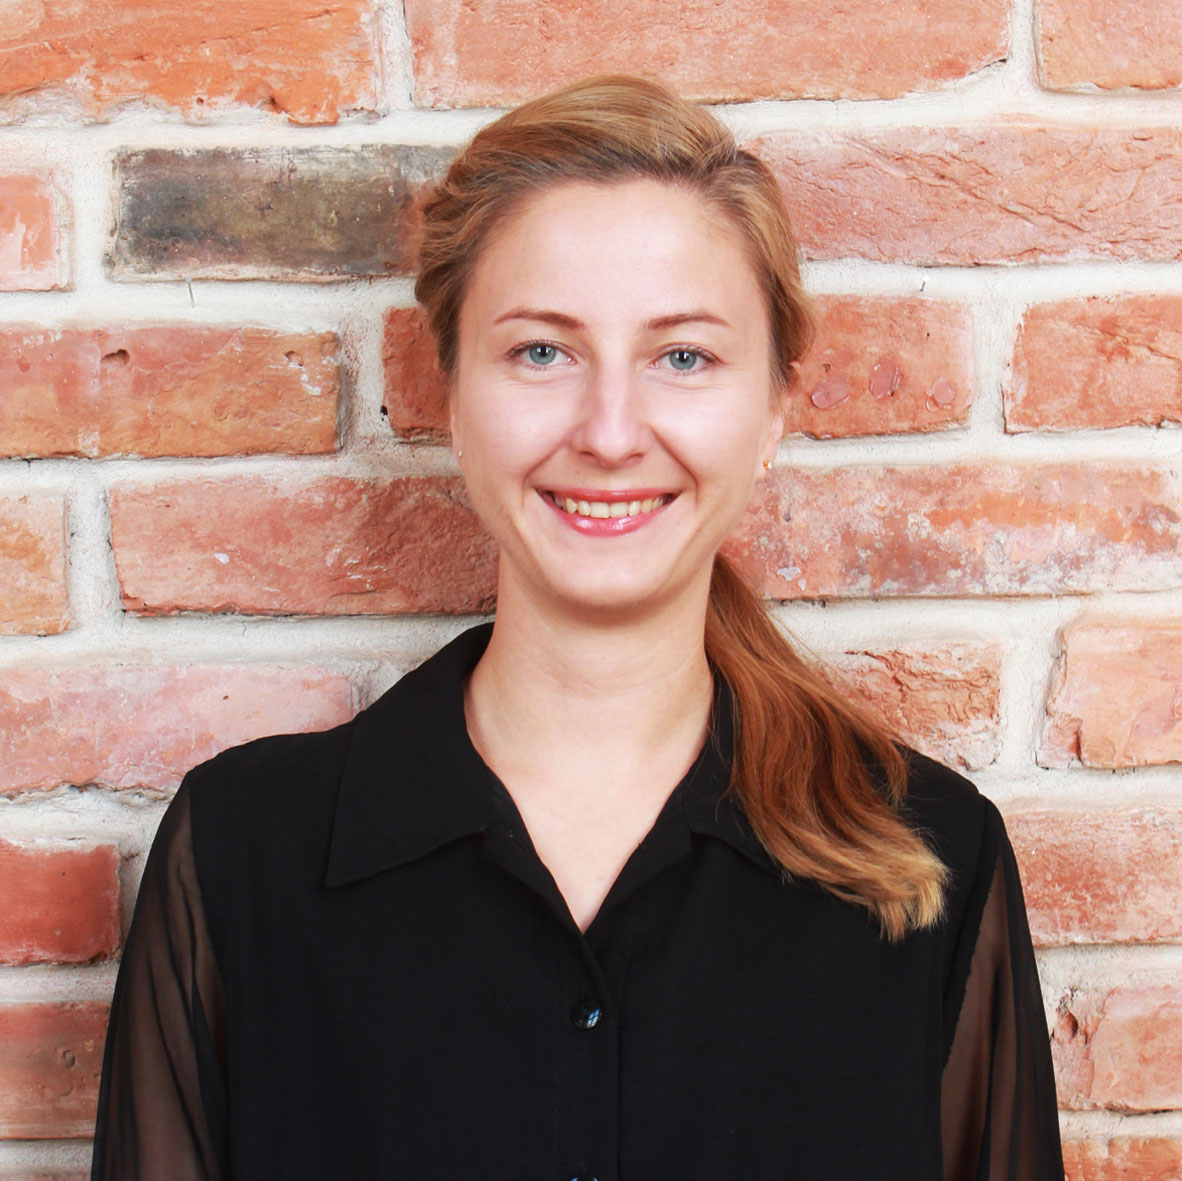 Barbora Tomíková